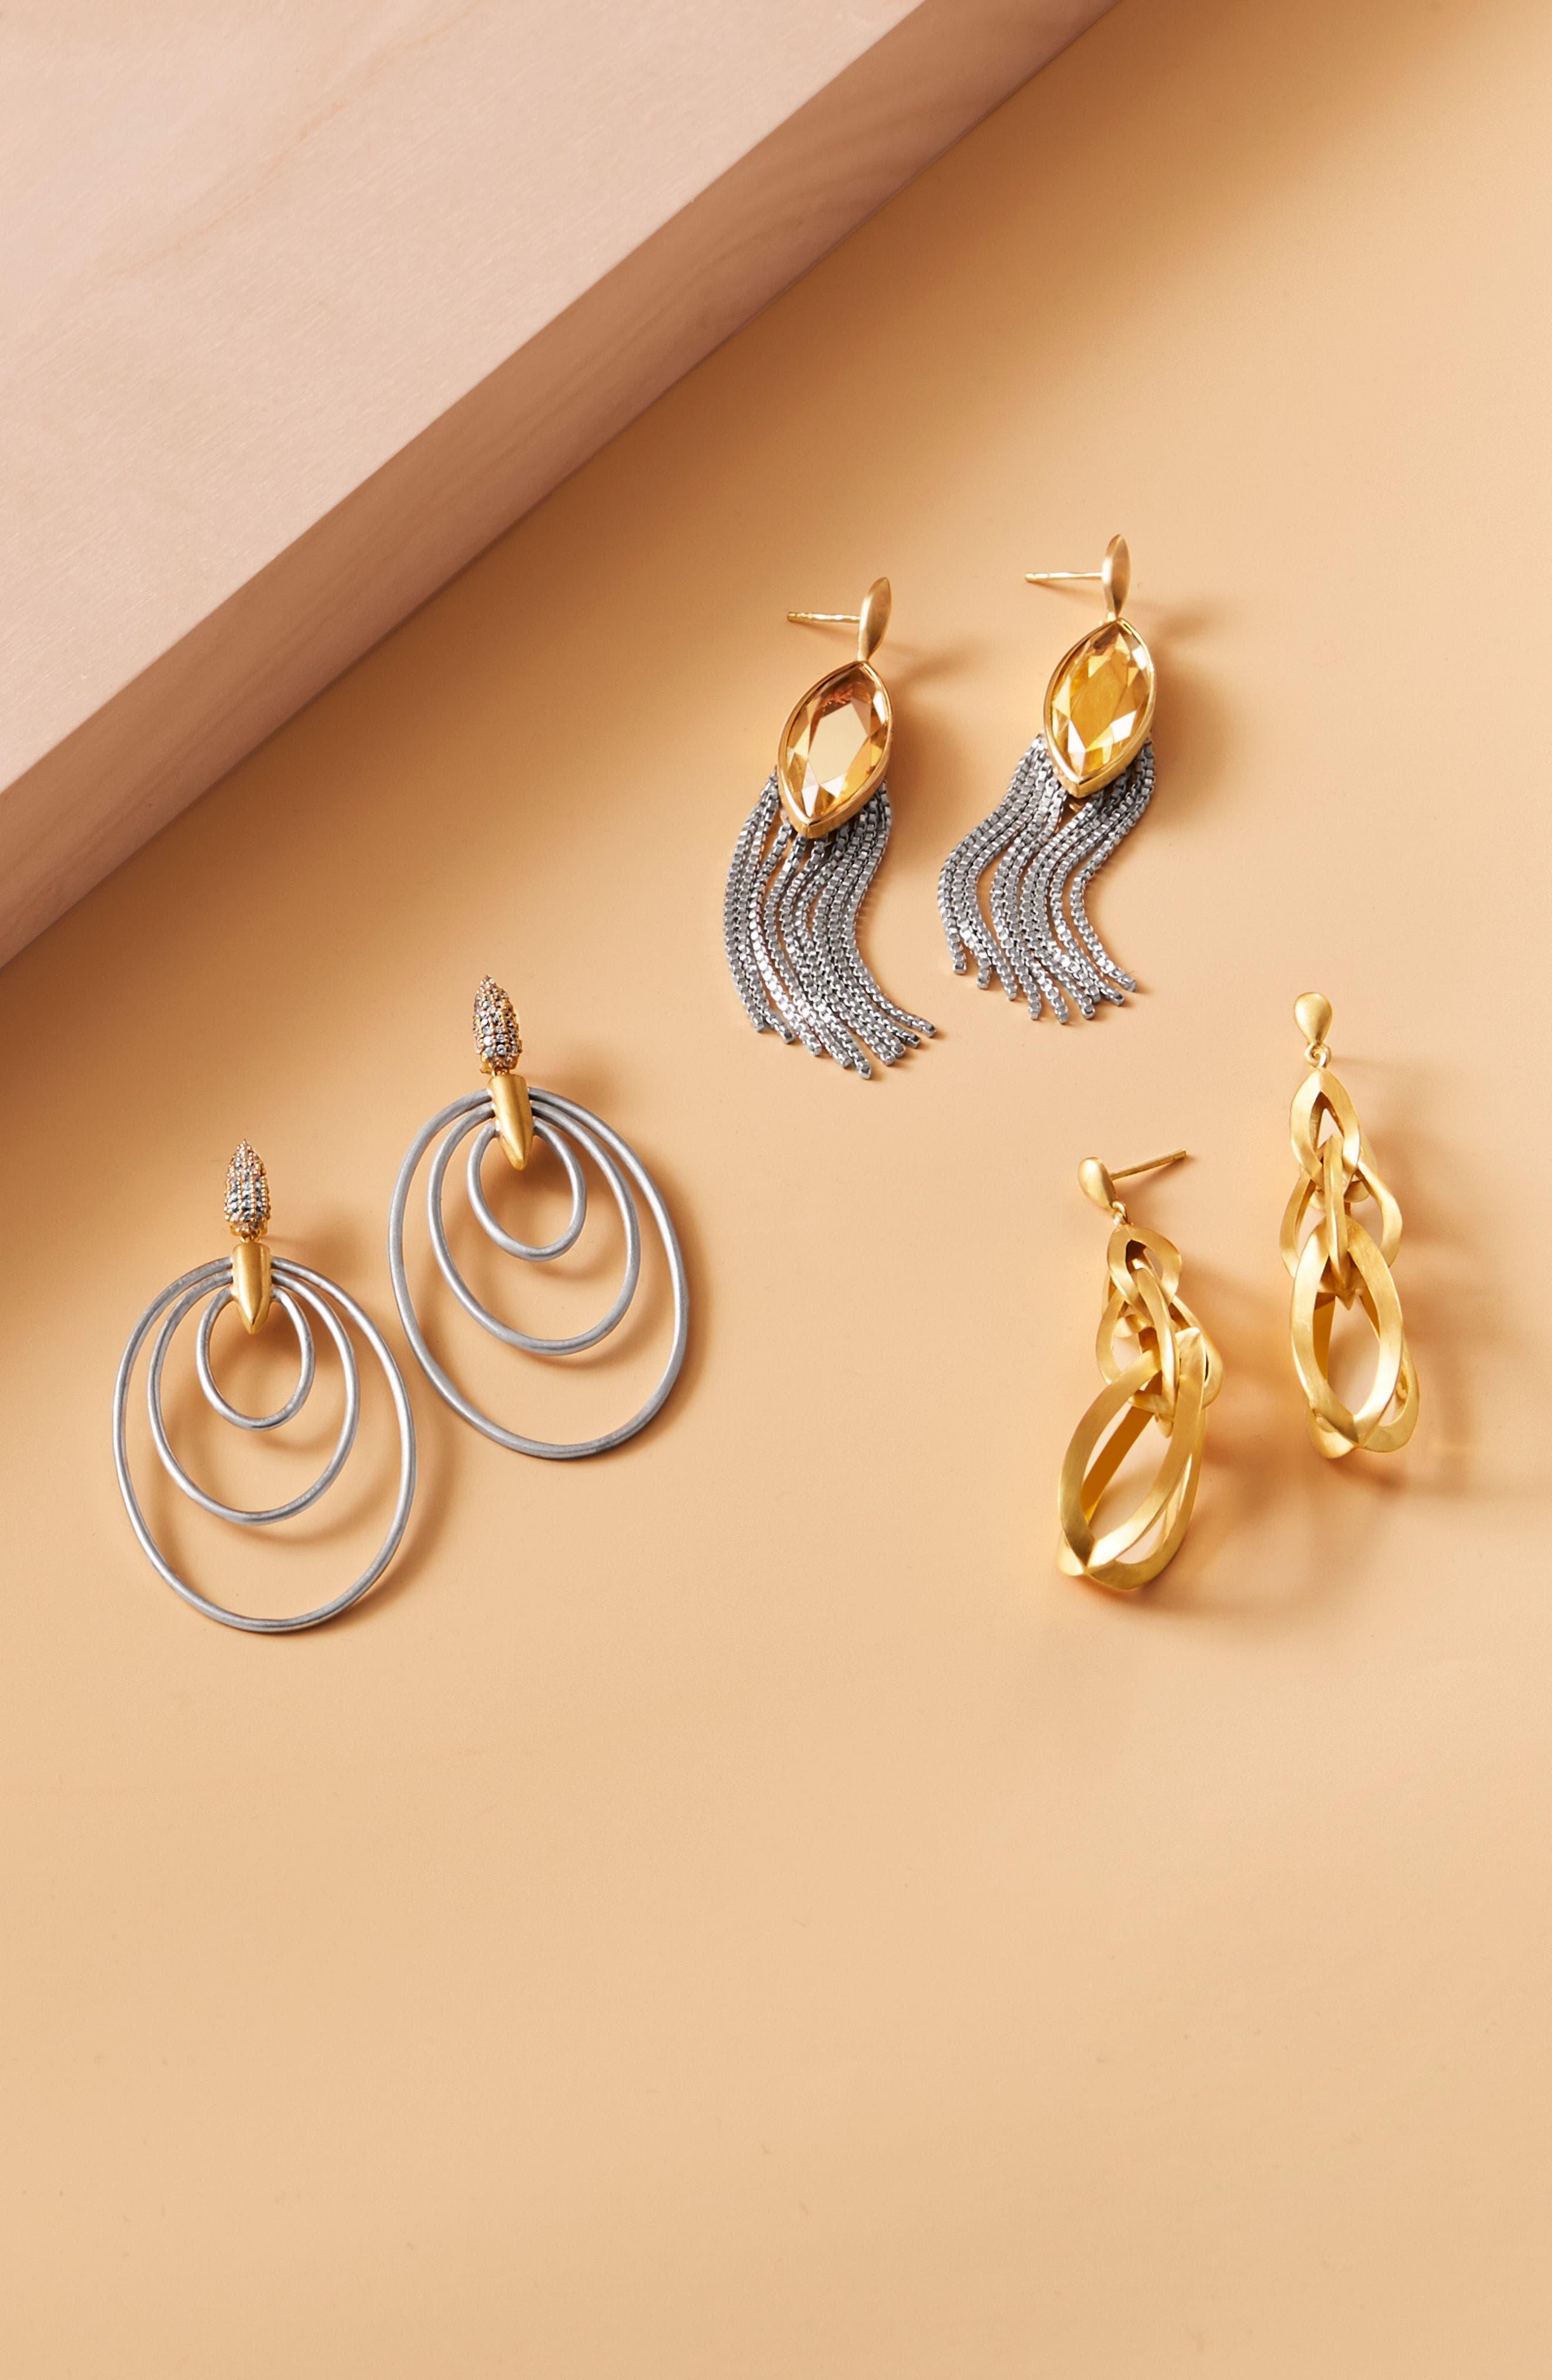 Ornate Semiprecious Stone Fringe Earrings,                             Alternate thumbnail 5, color,